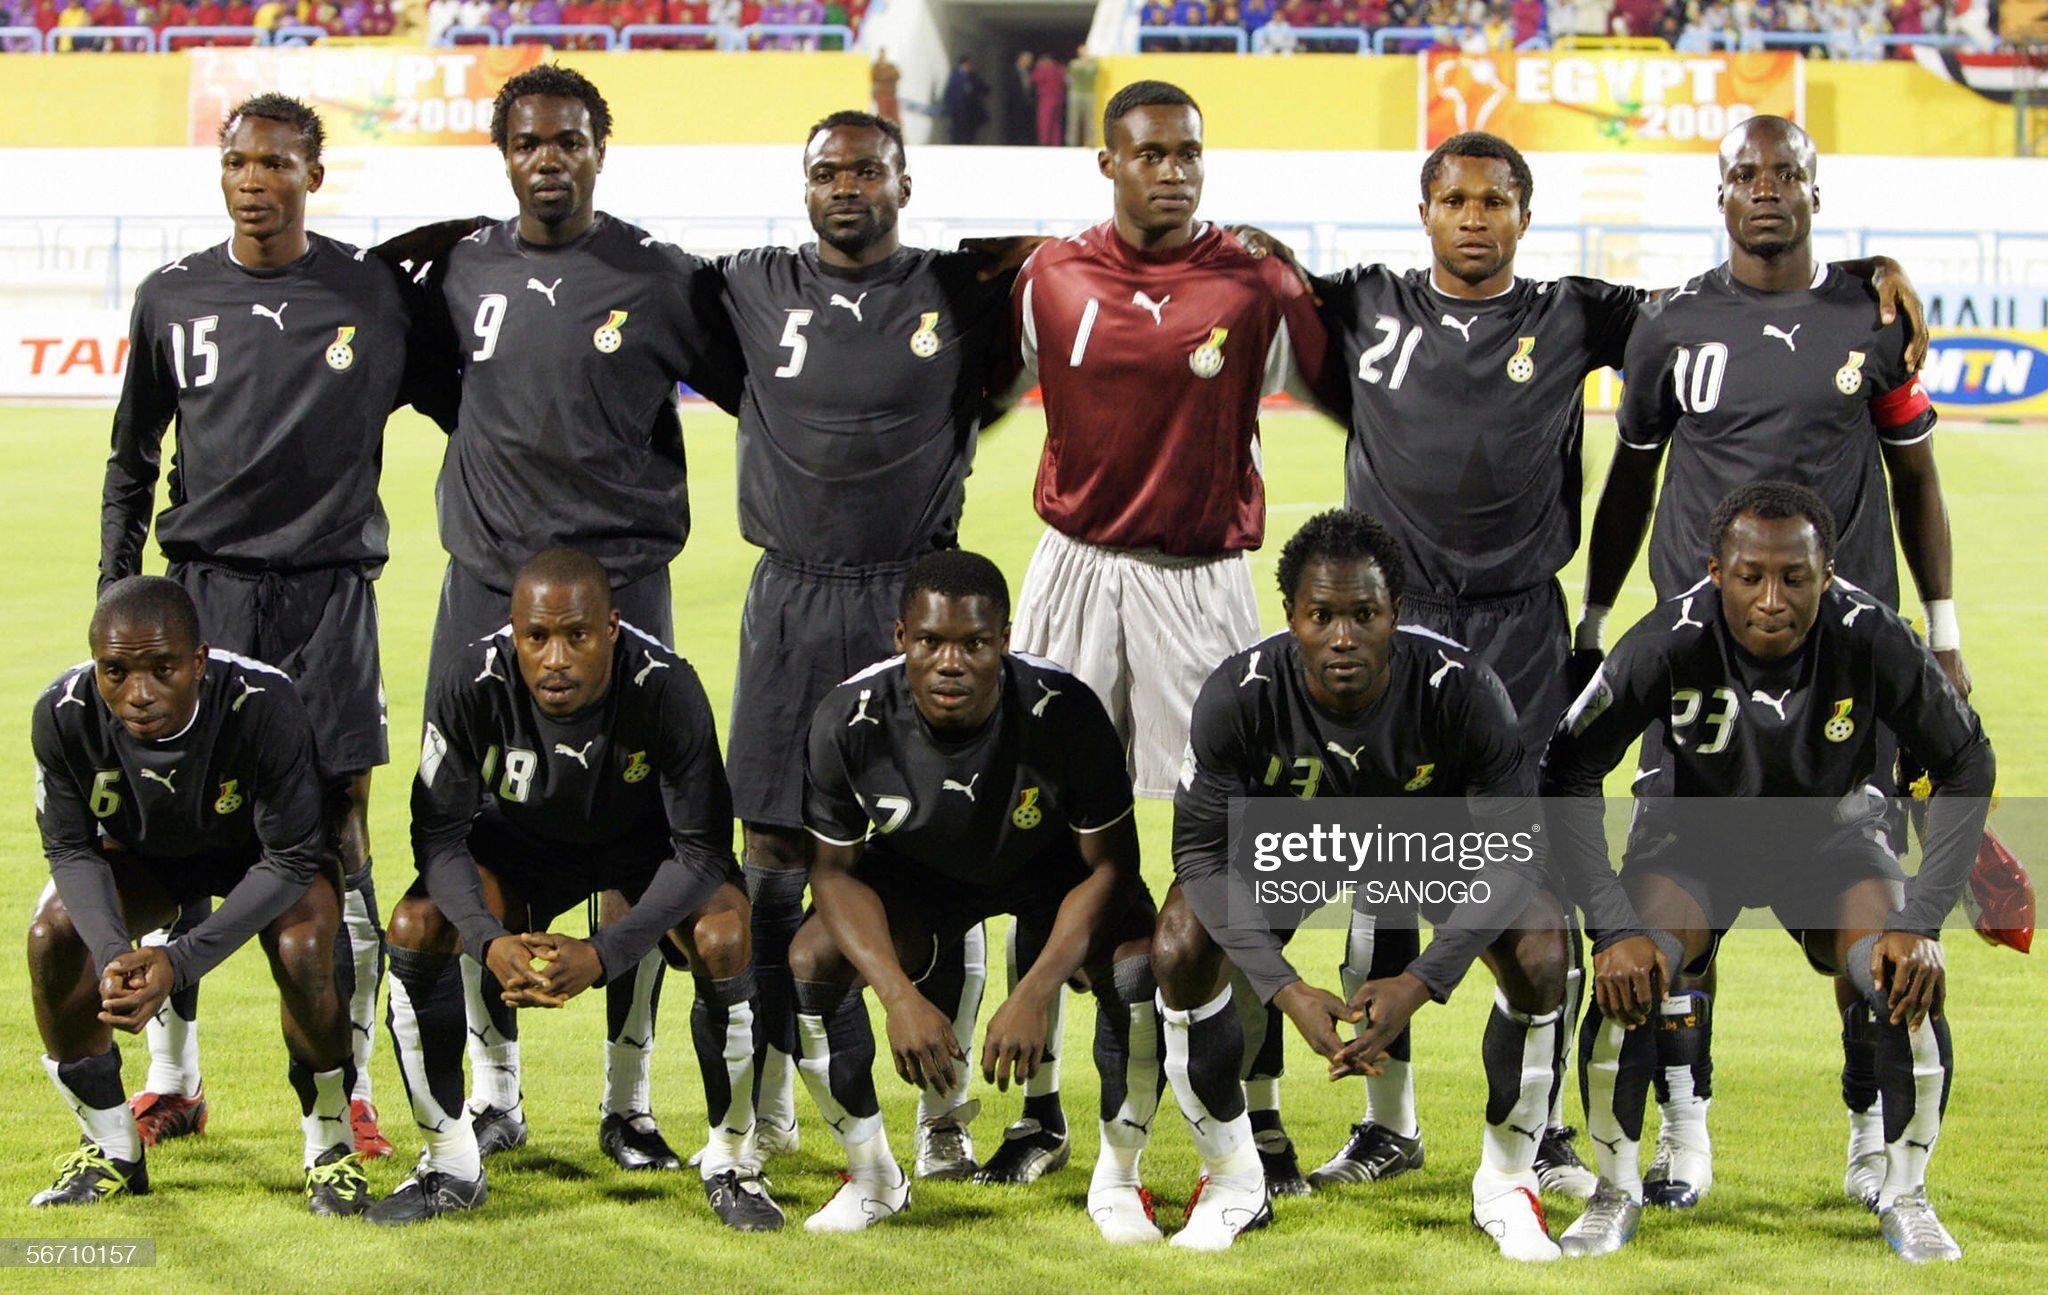 Ghanaian official line-up: Top (L-R) Gha : News Photo